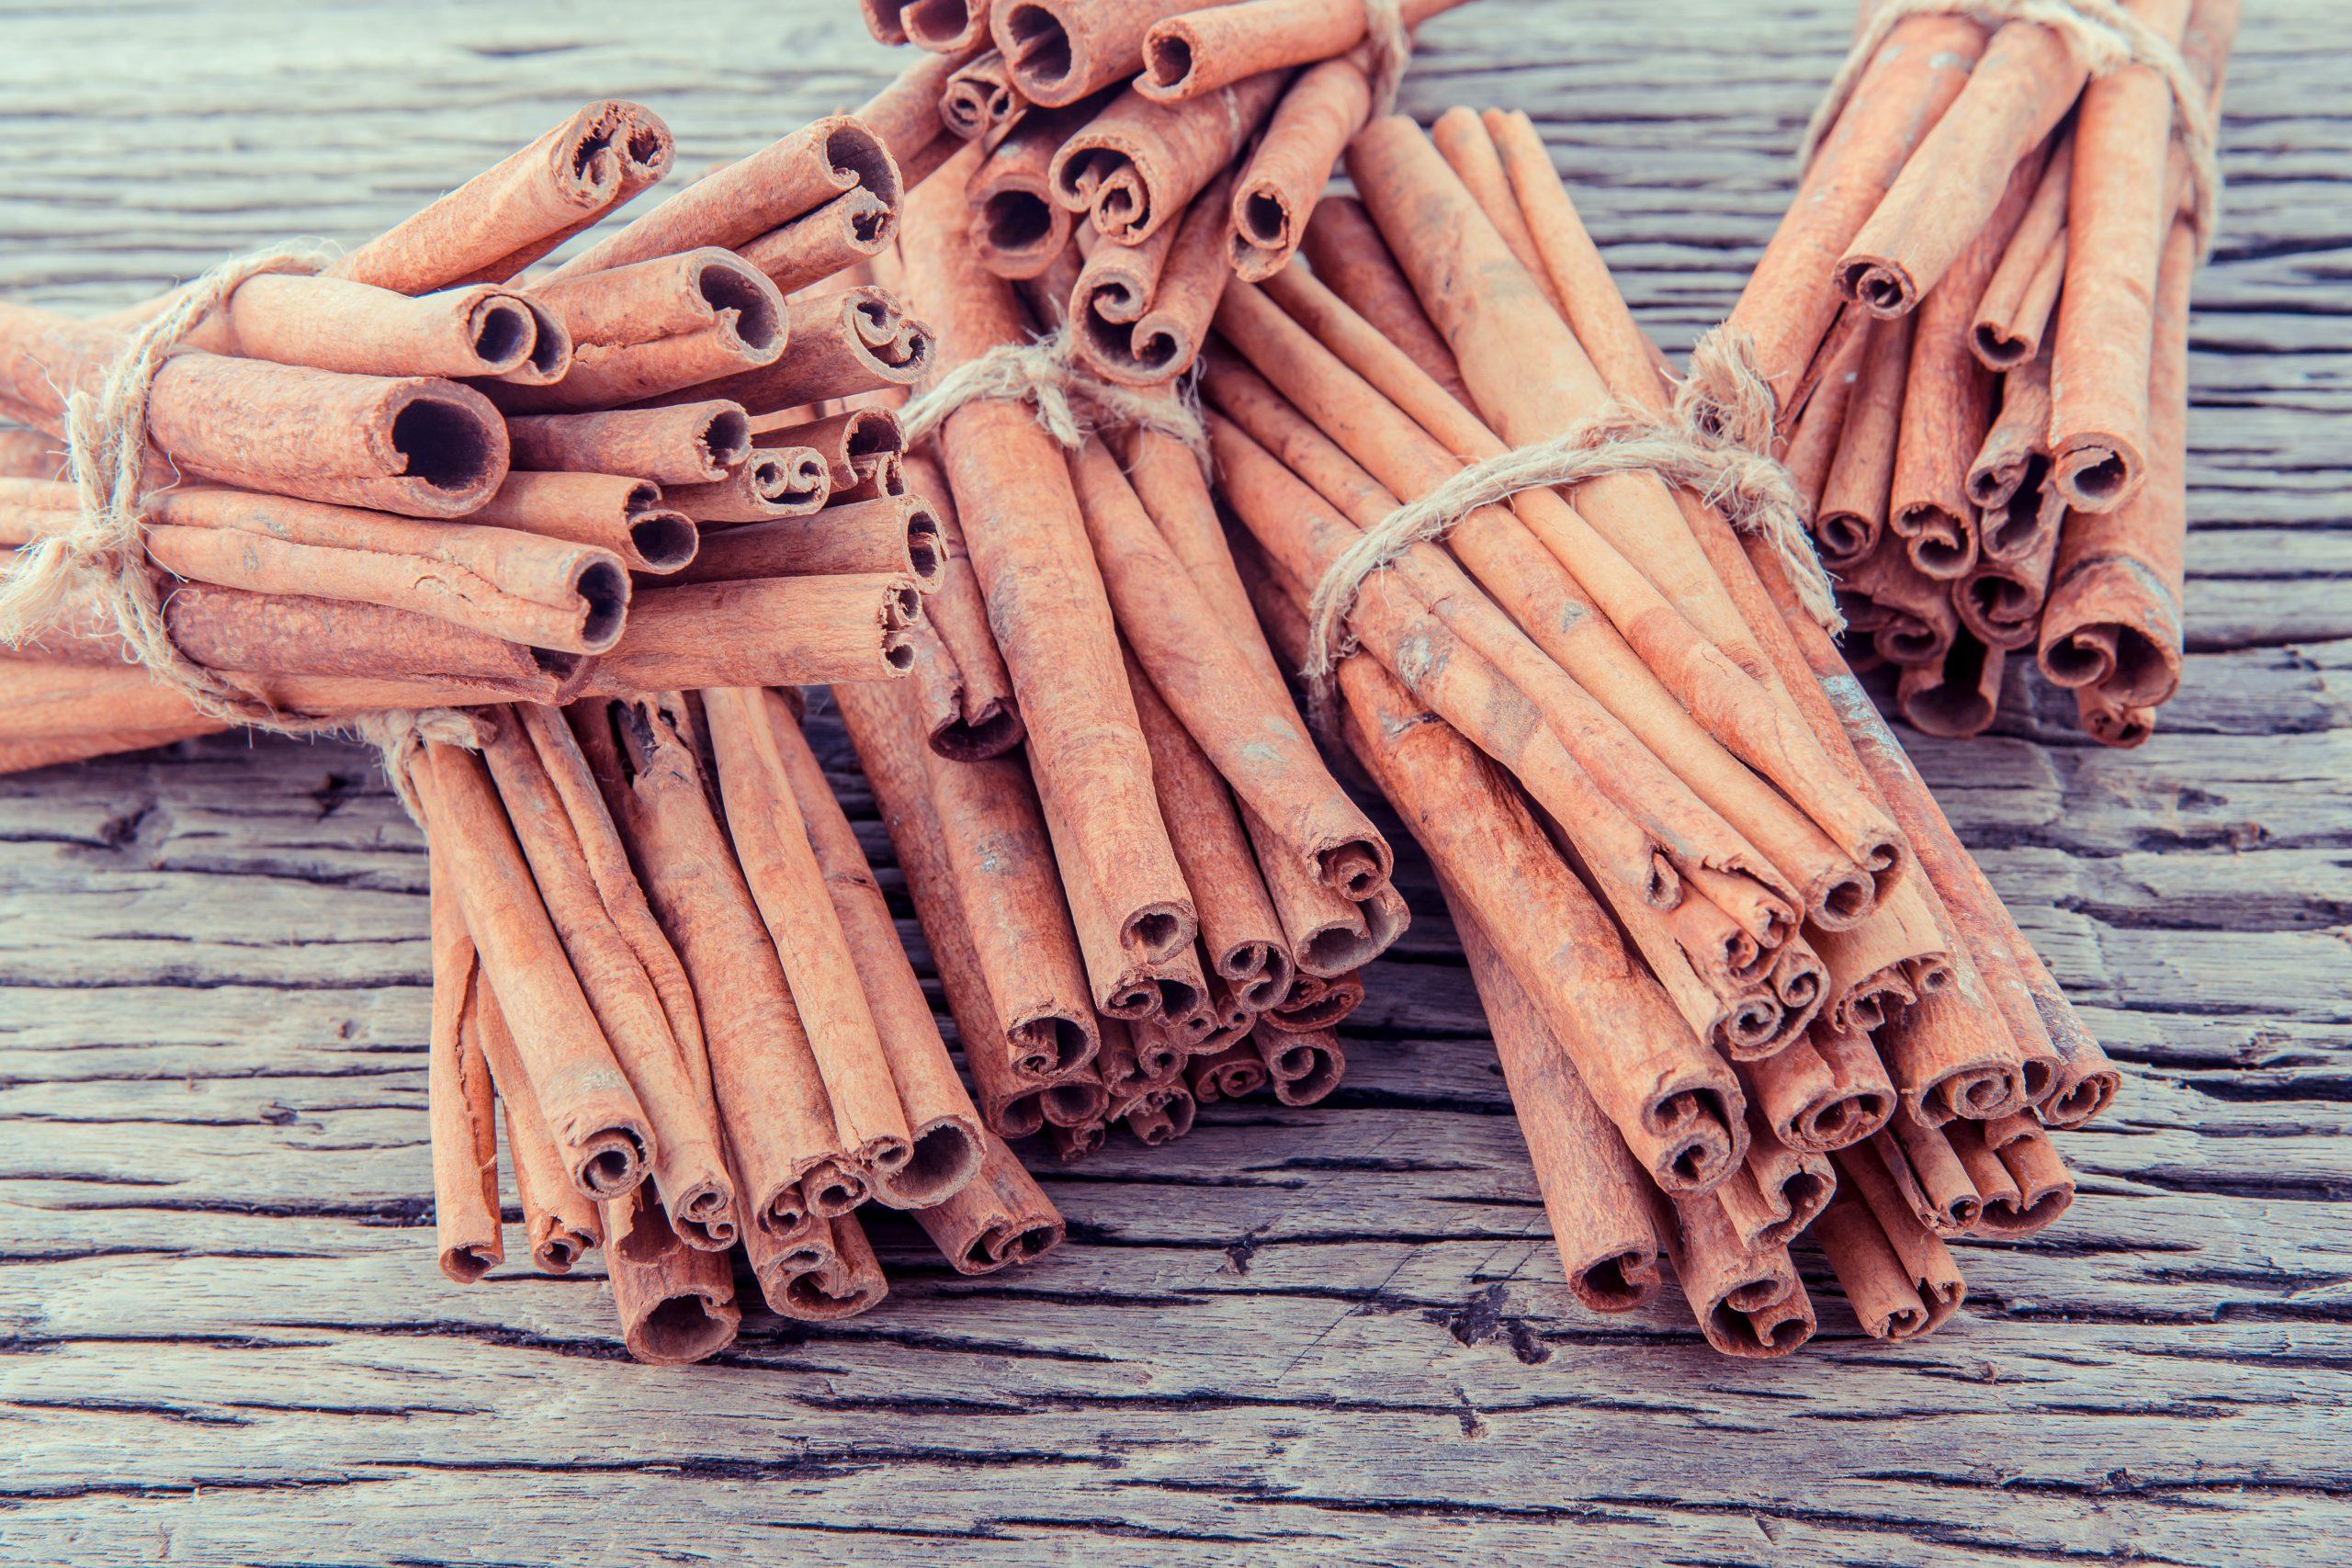 health benefits of cinnamon, ceylon cinnamon benefits, cinnamon benefits, benefits of cinnamon tea